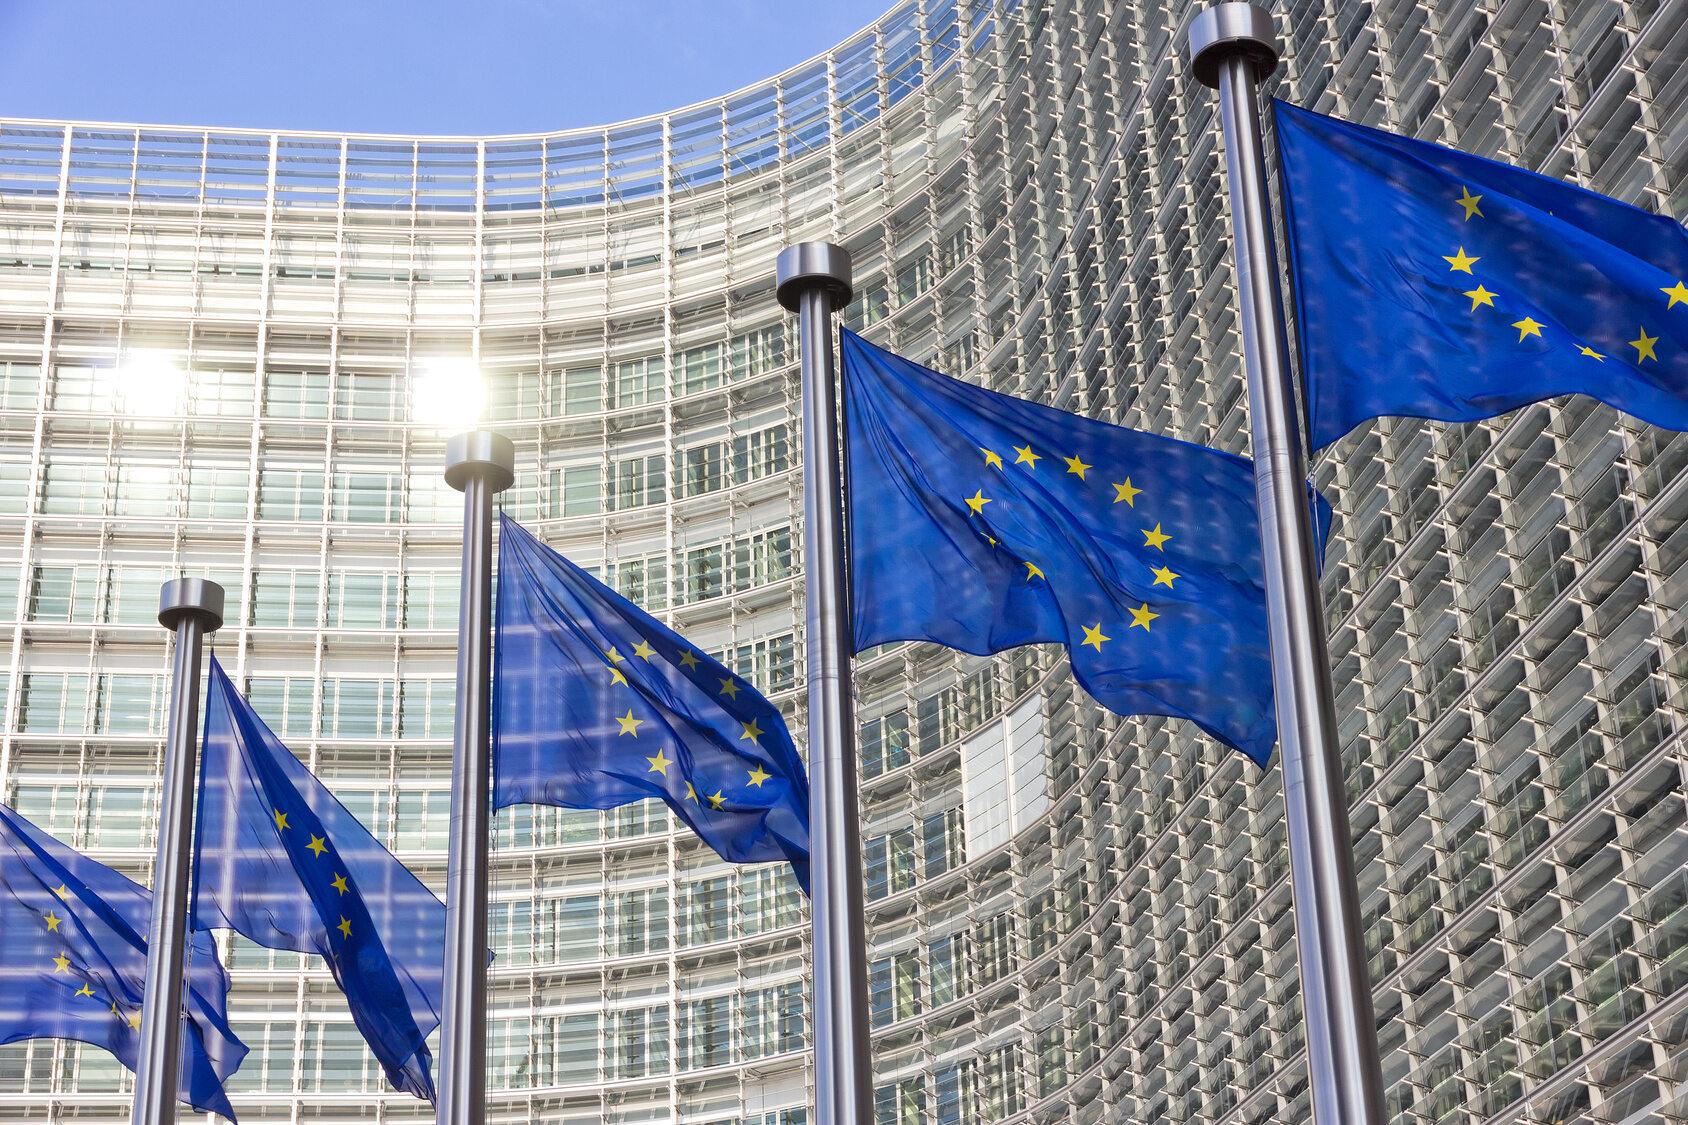 Flagi unijne